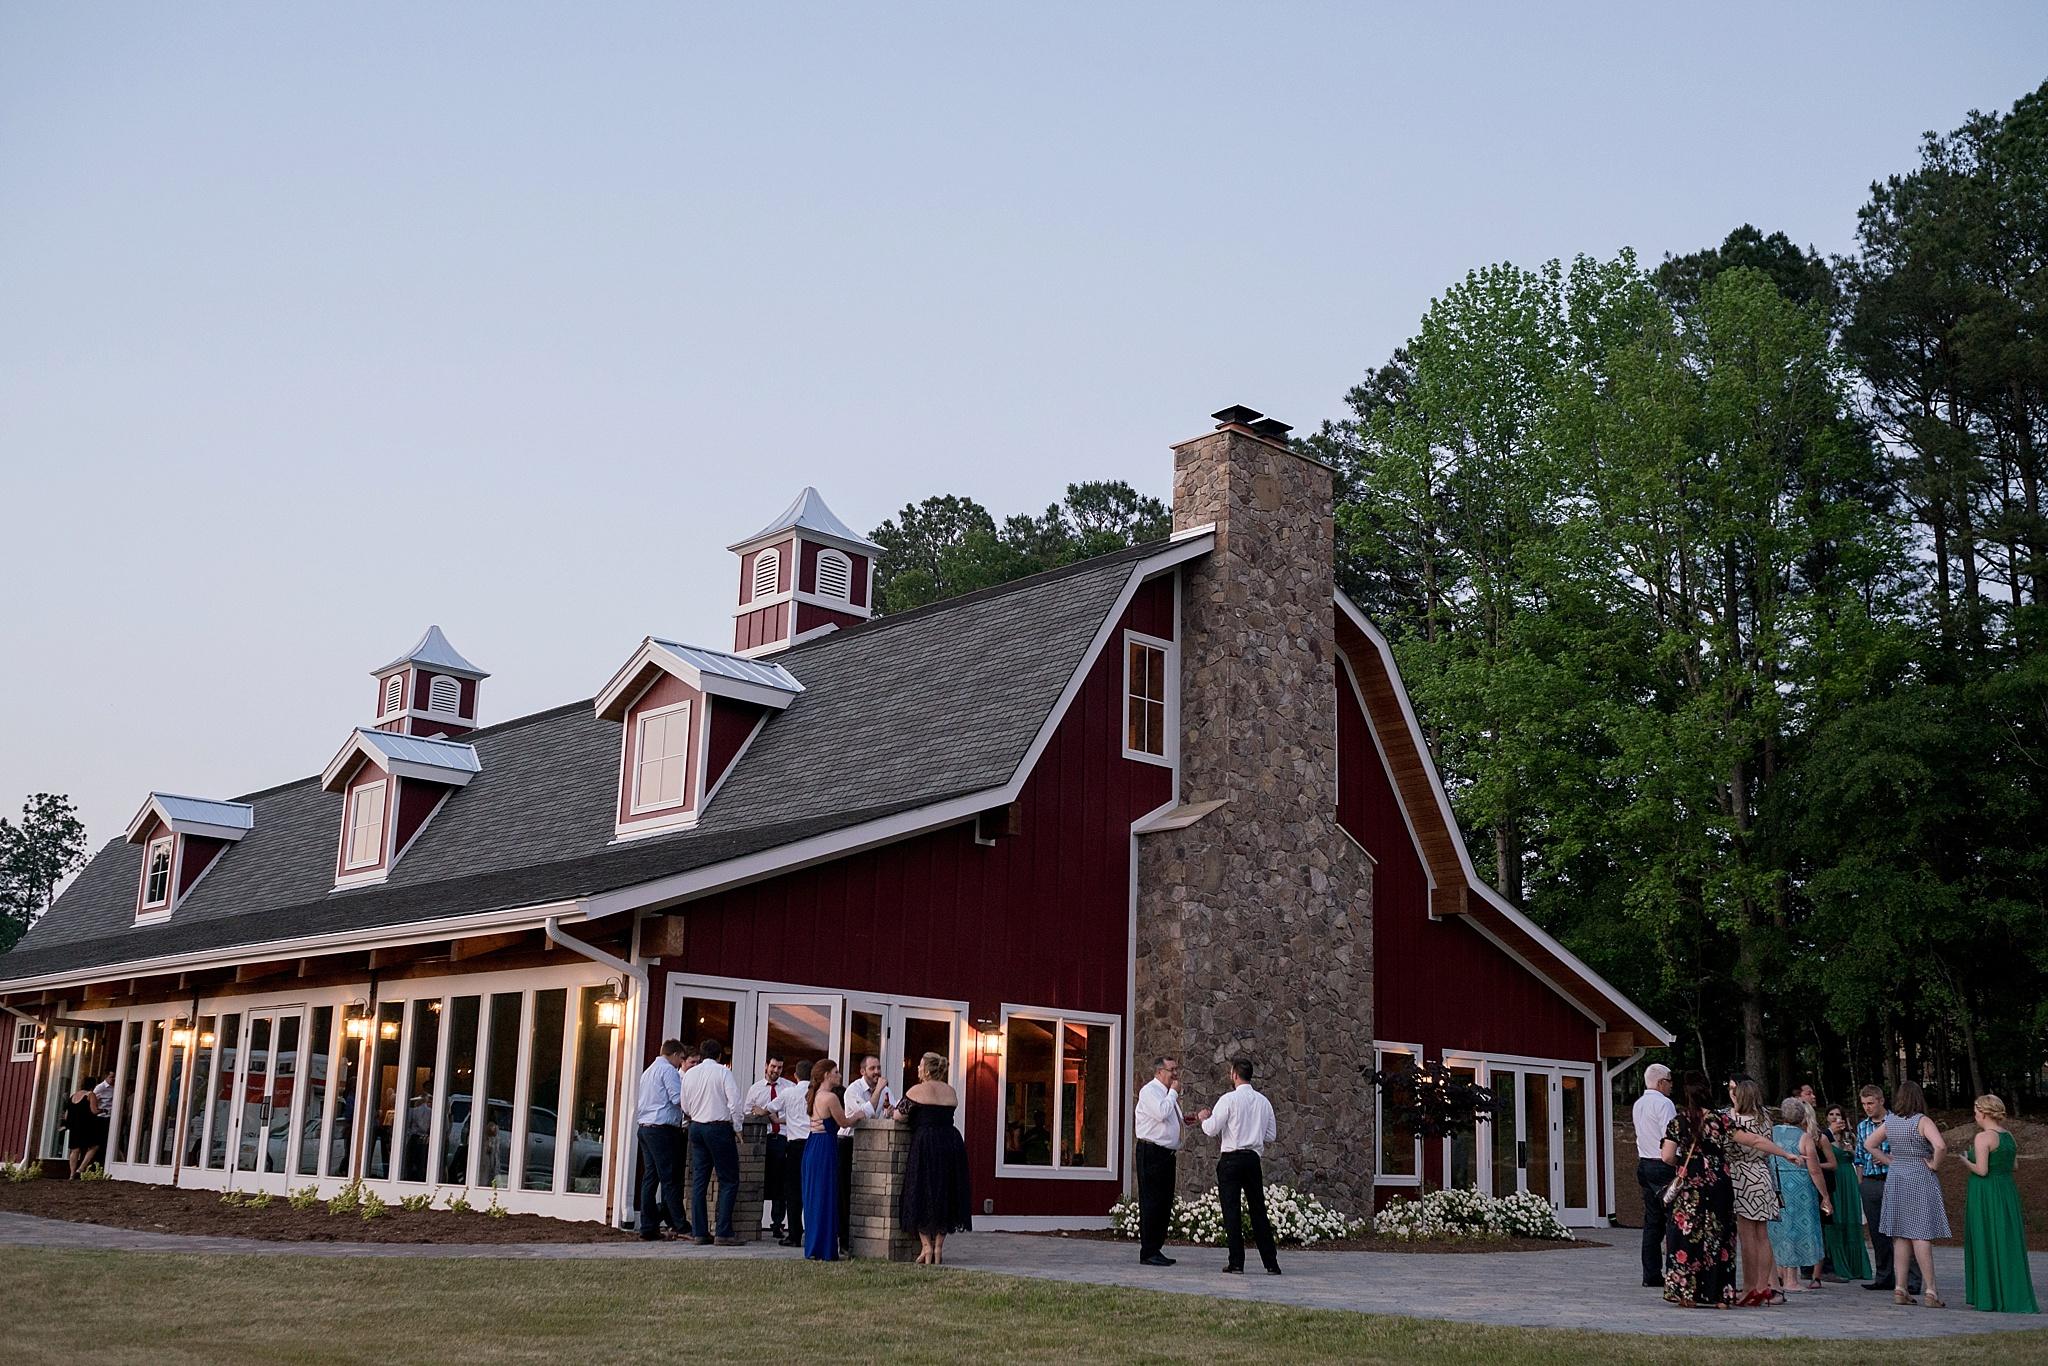 Pavilion-Carriage-Farms-Wedding-Photographer-231.jpg